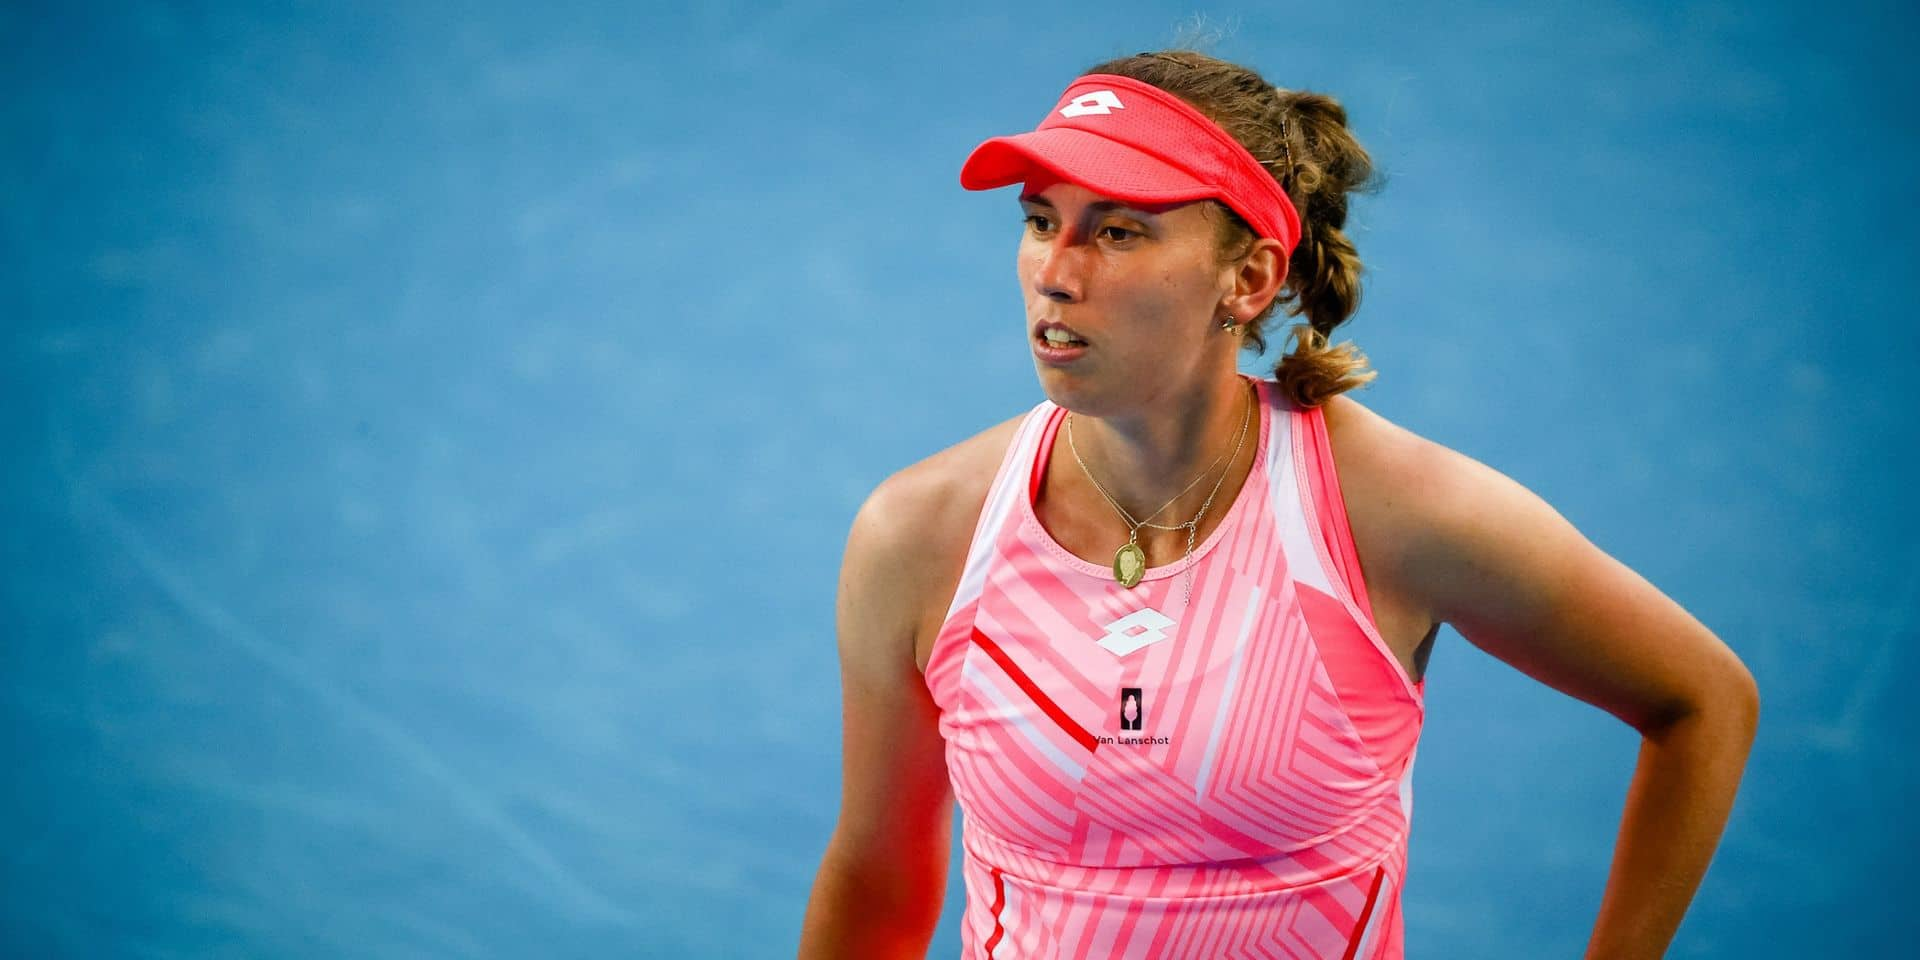 Elise Mertens forfait à Saint-Pétersbourg, Kirsten Flipkens débute face à Katerina Siniakova